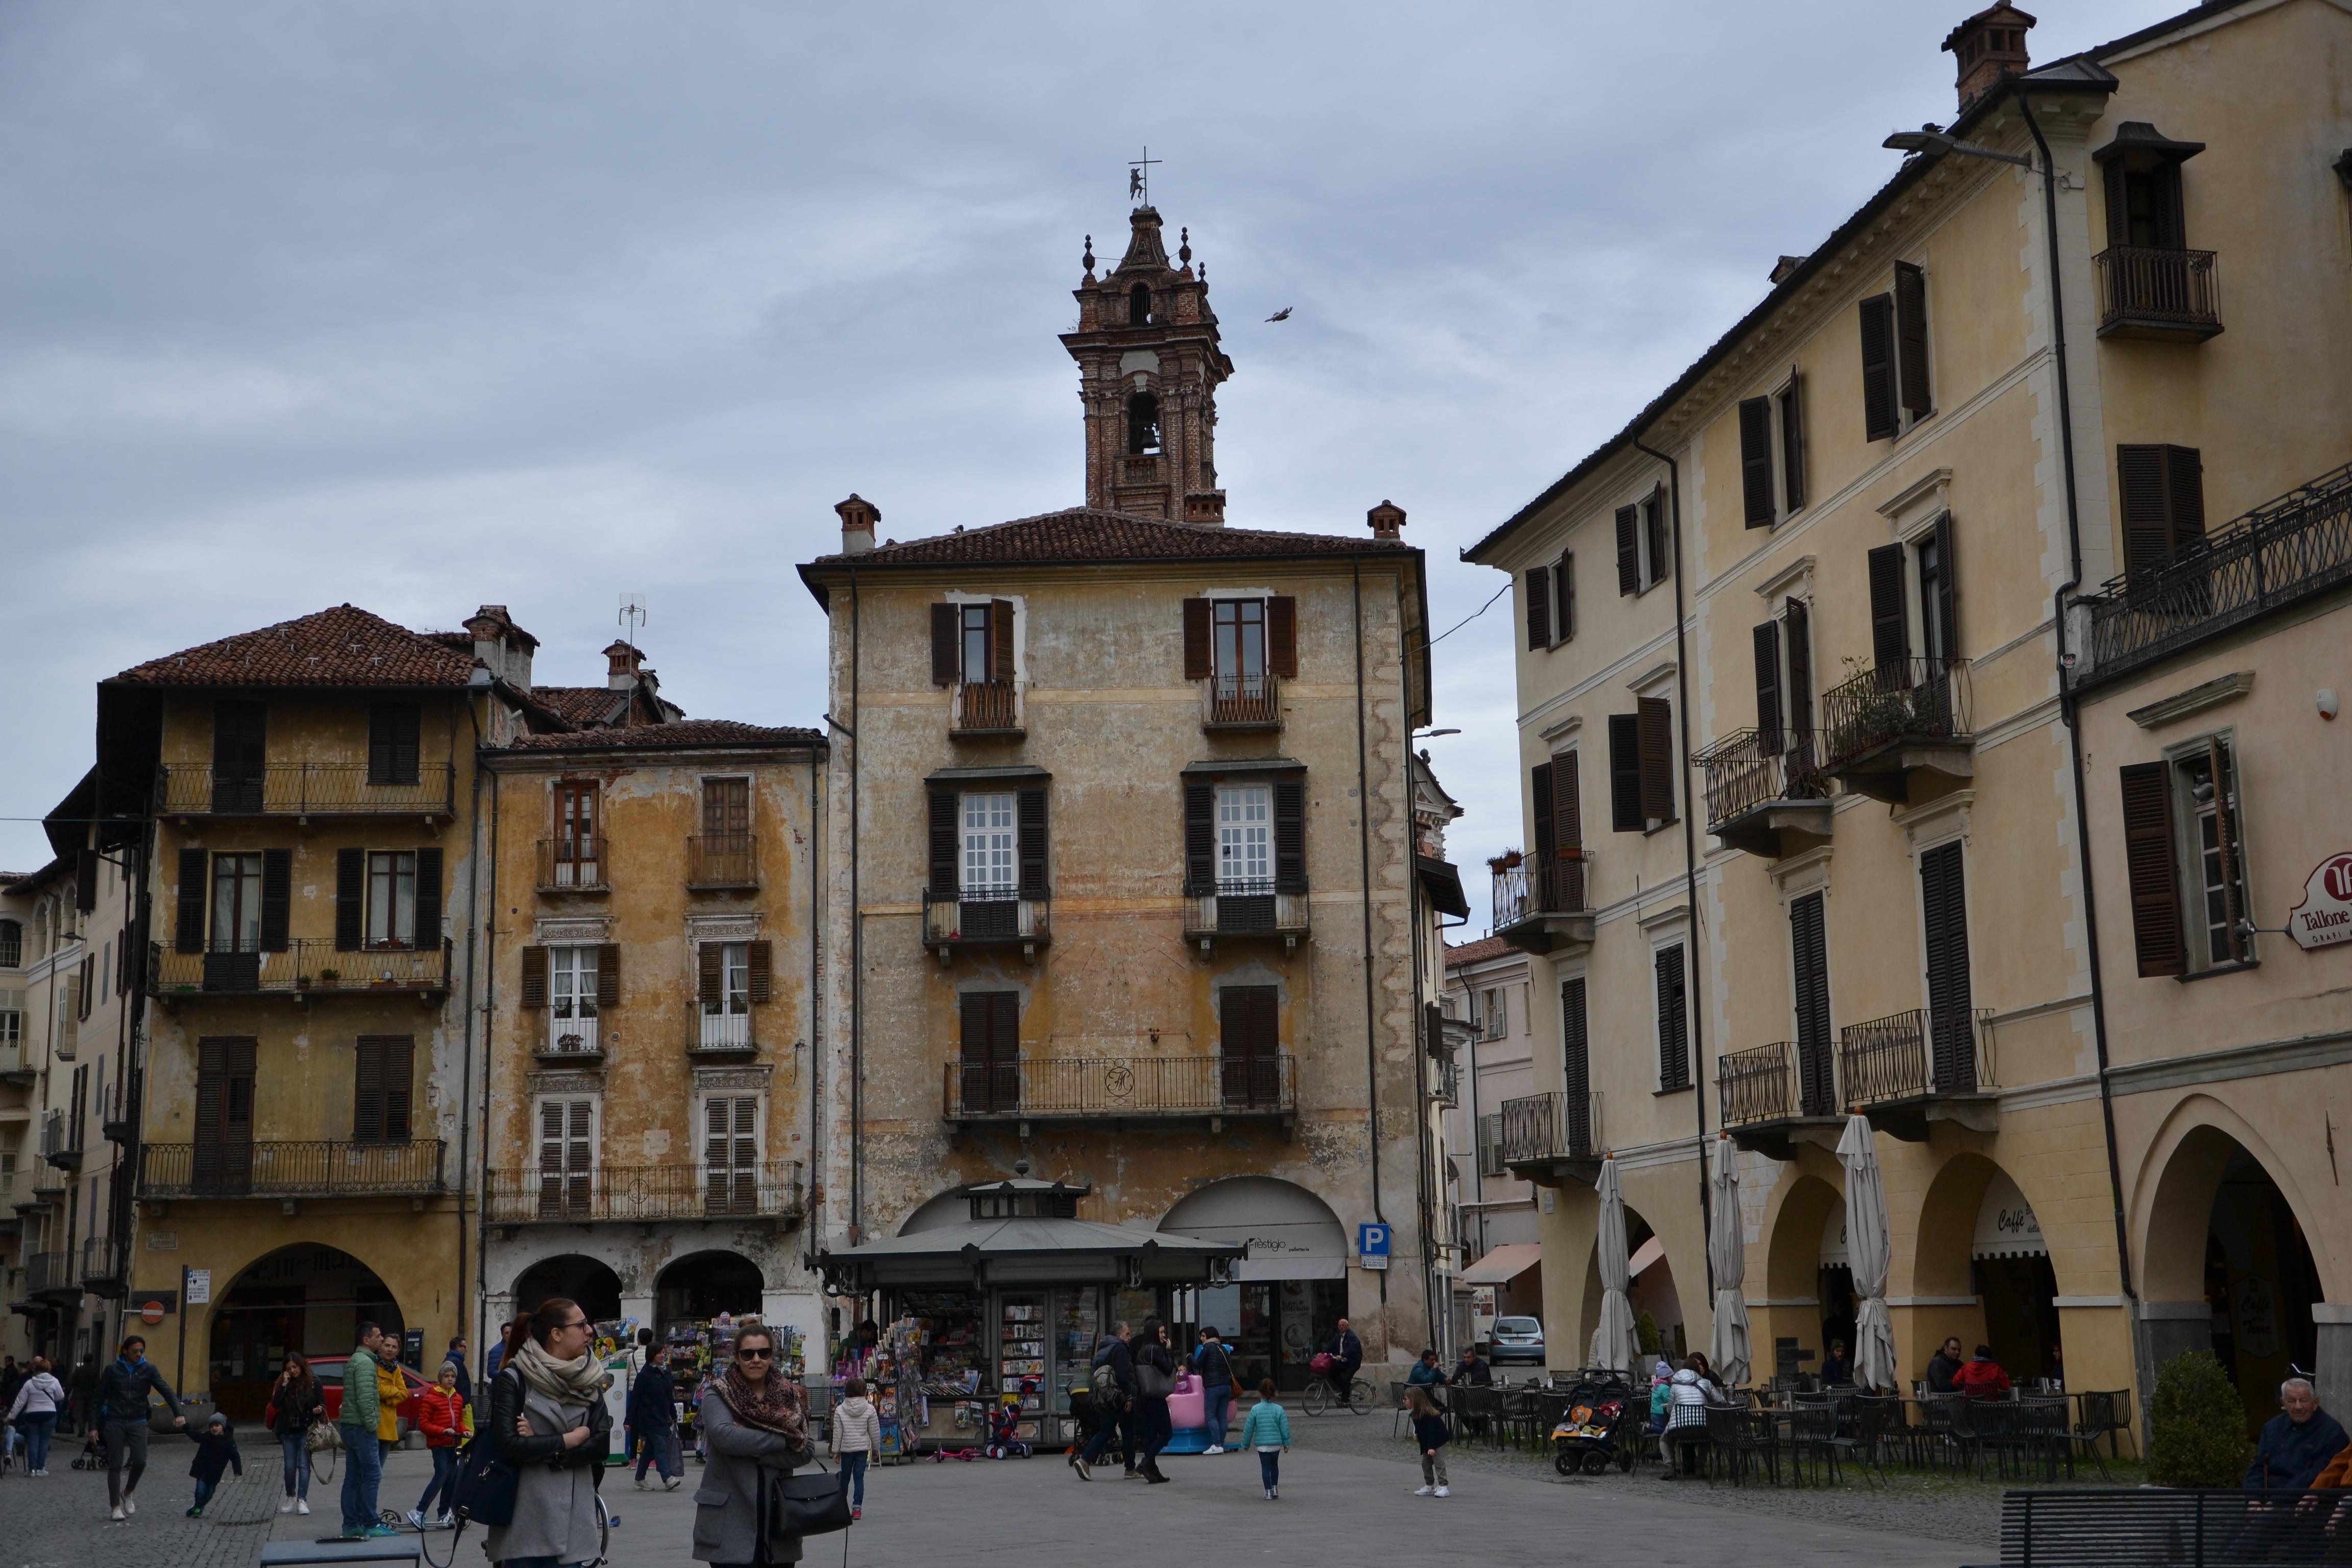 Piazza Santa Rosa